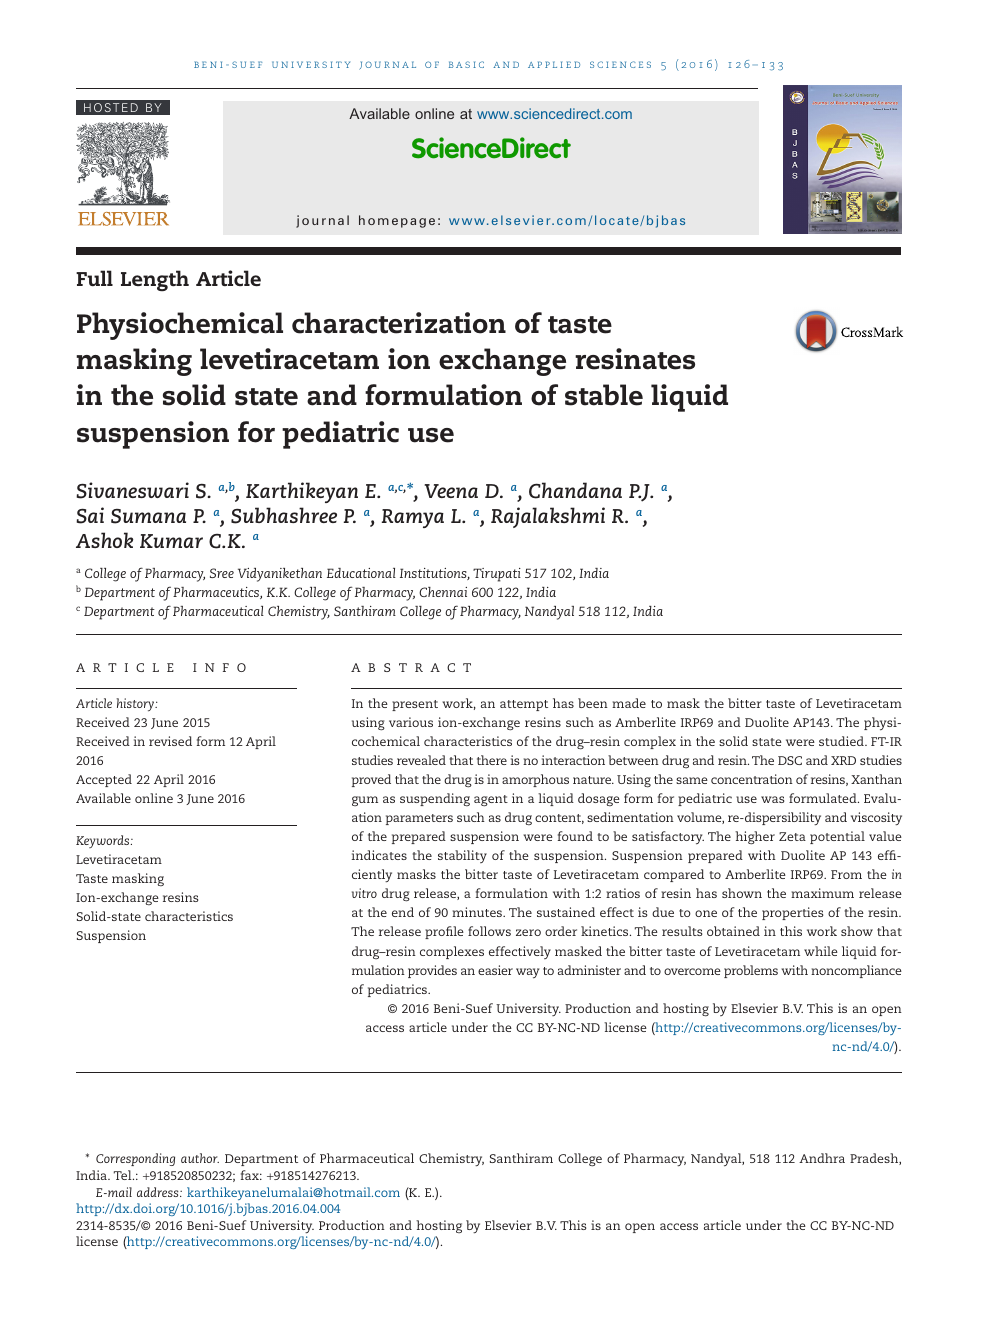 Physiochemical characterization of taste masking